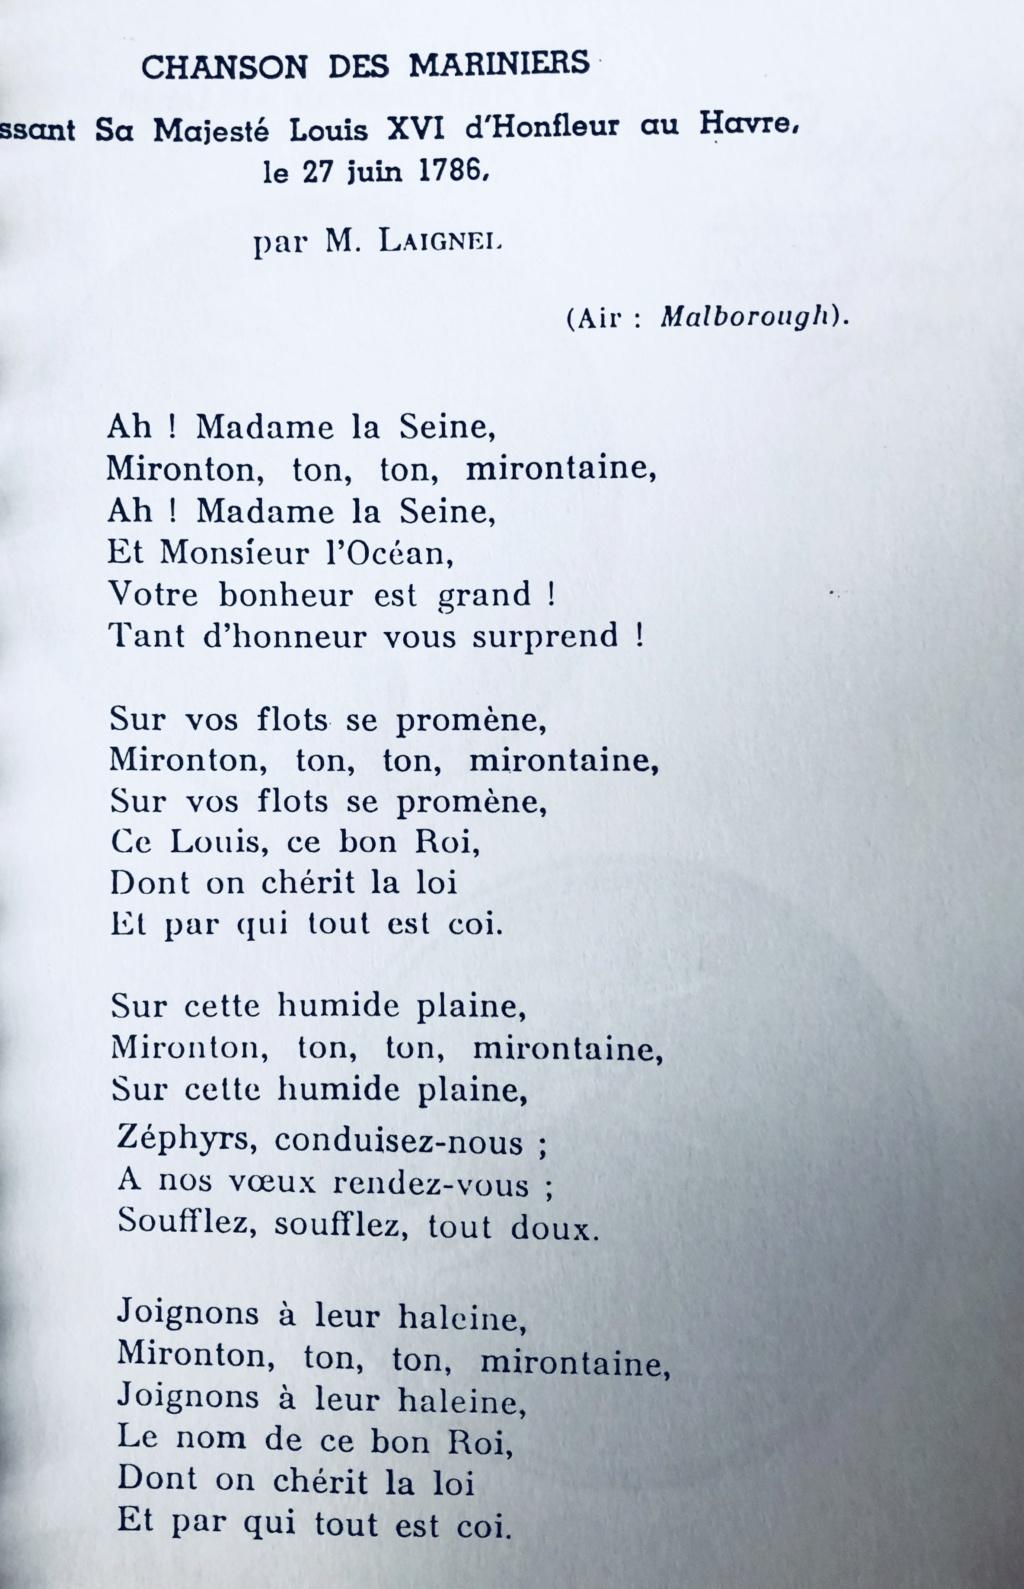 Le voyage de Louis XVI en Normandie - Page 2 4149d310